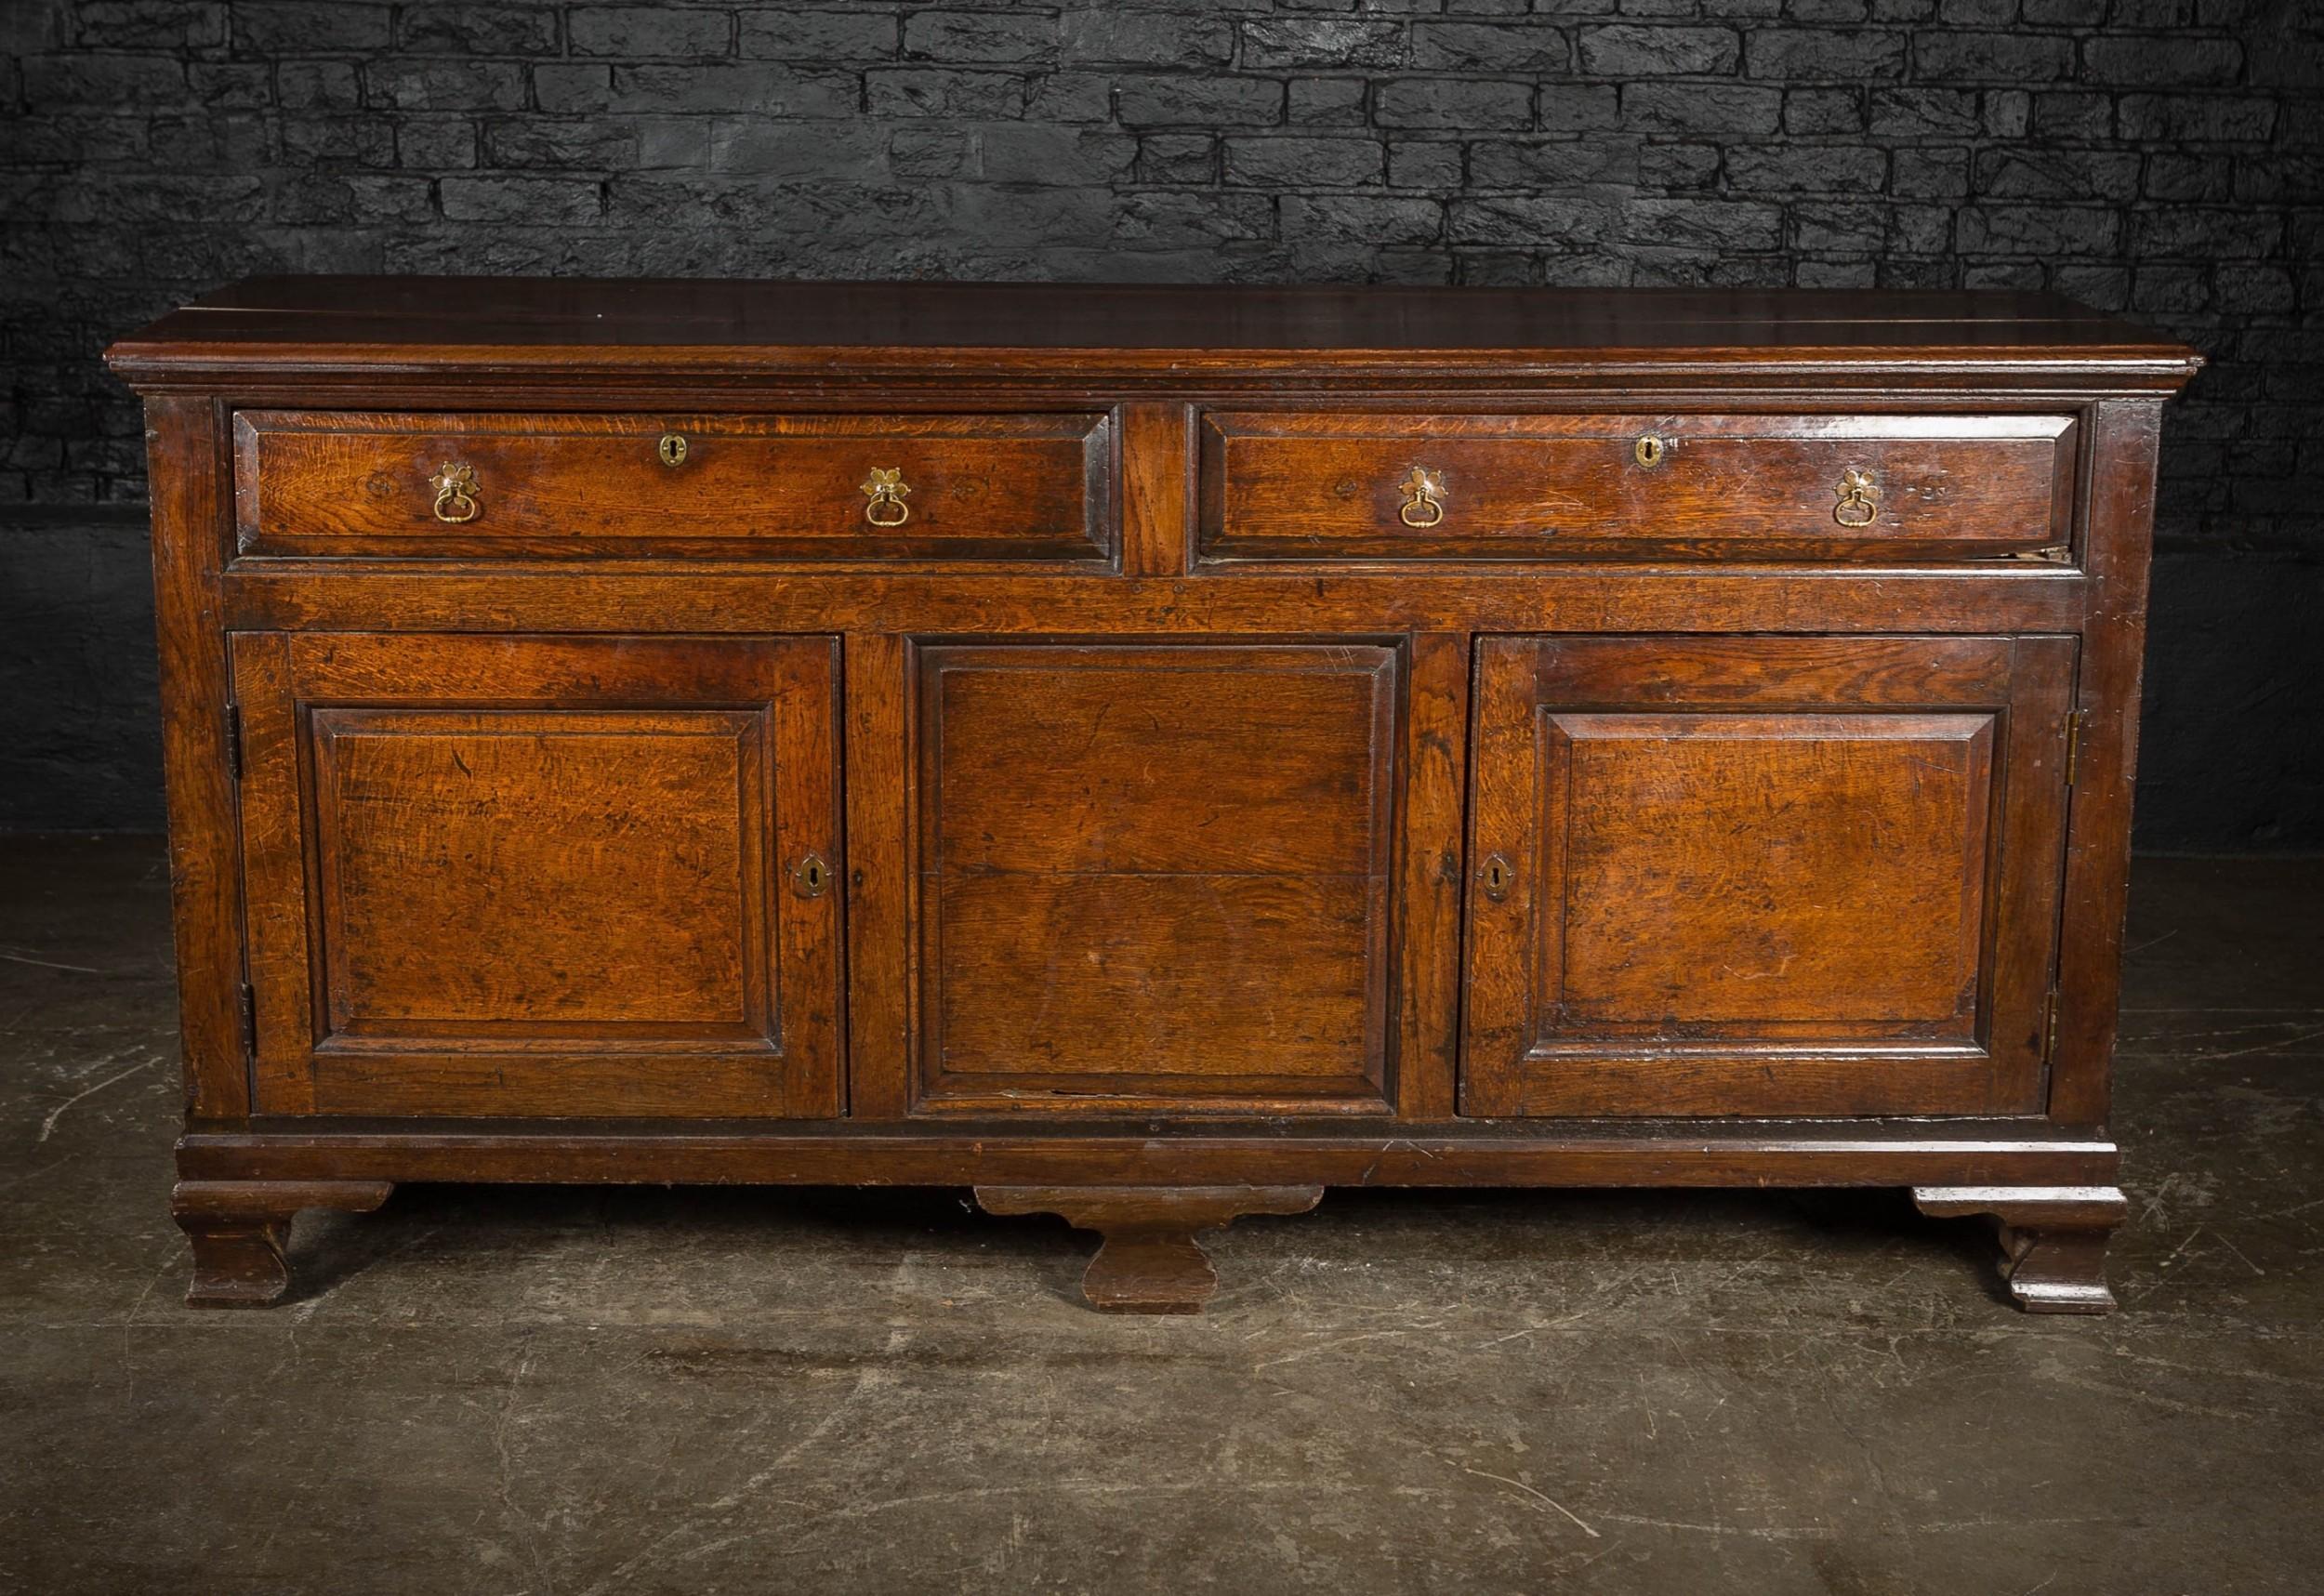 george ii oak sideboard with brass pull handles